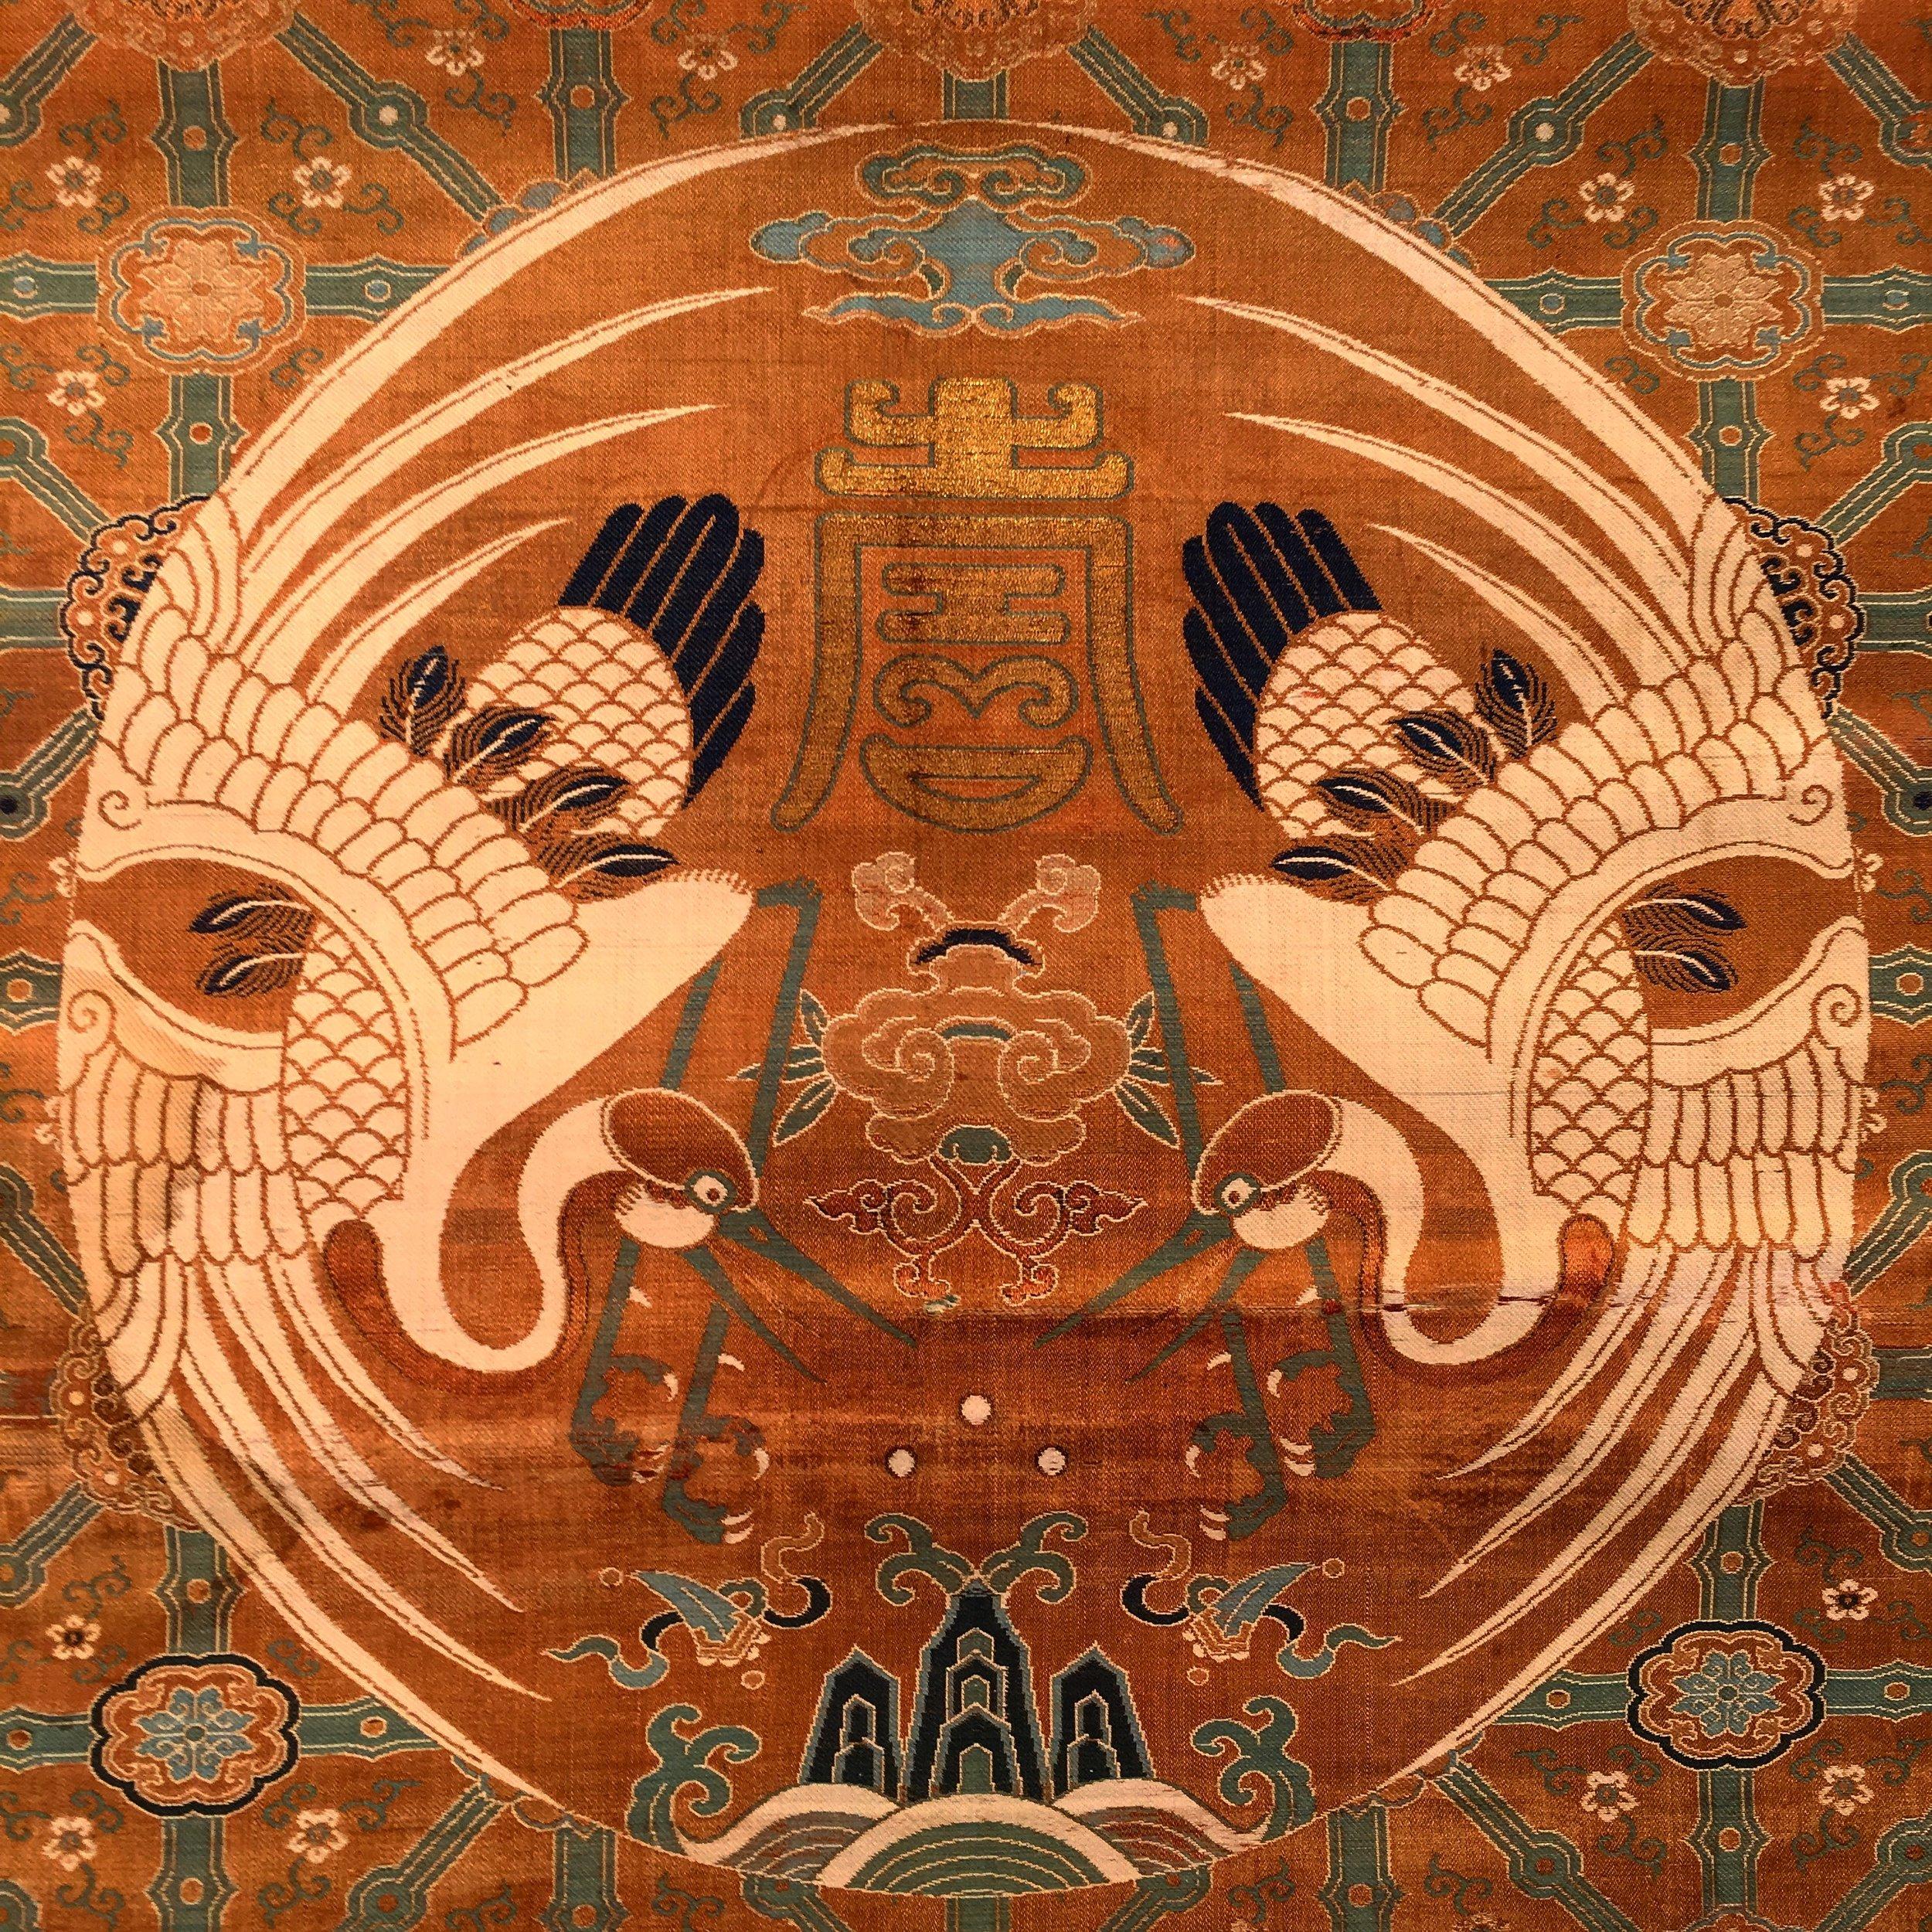 Details of Ming Kesi Textile